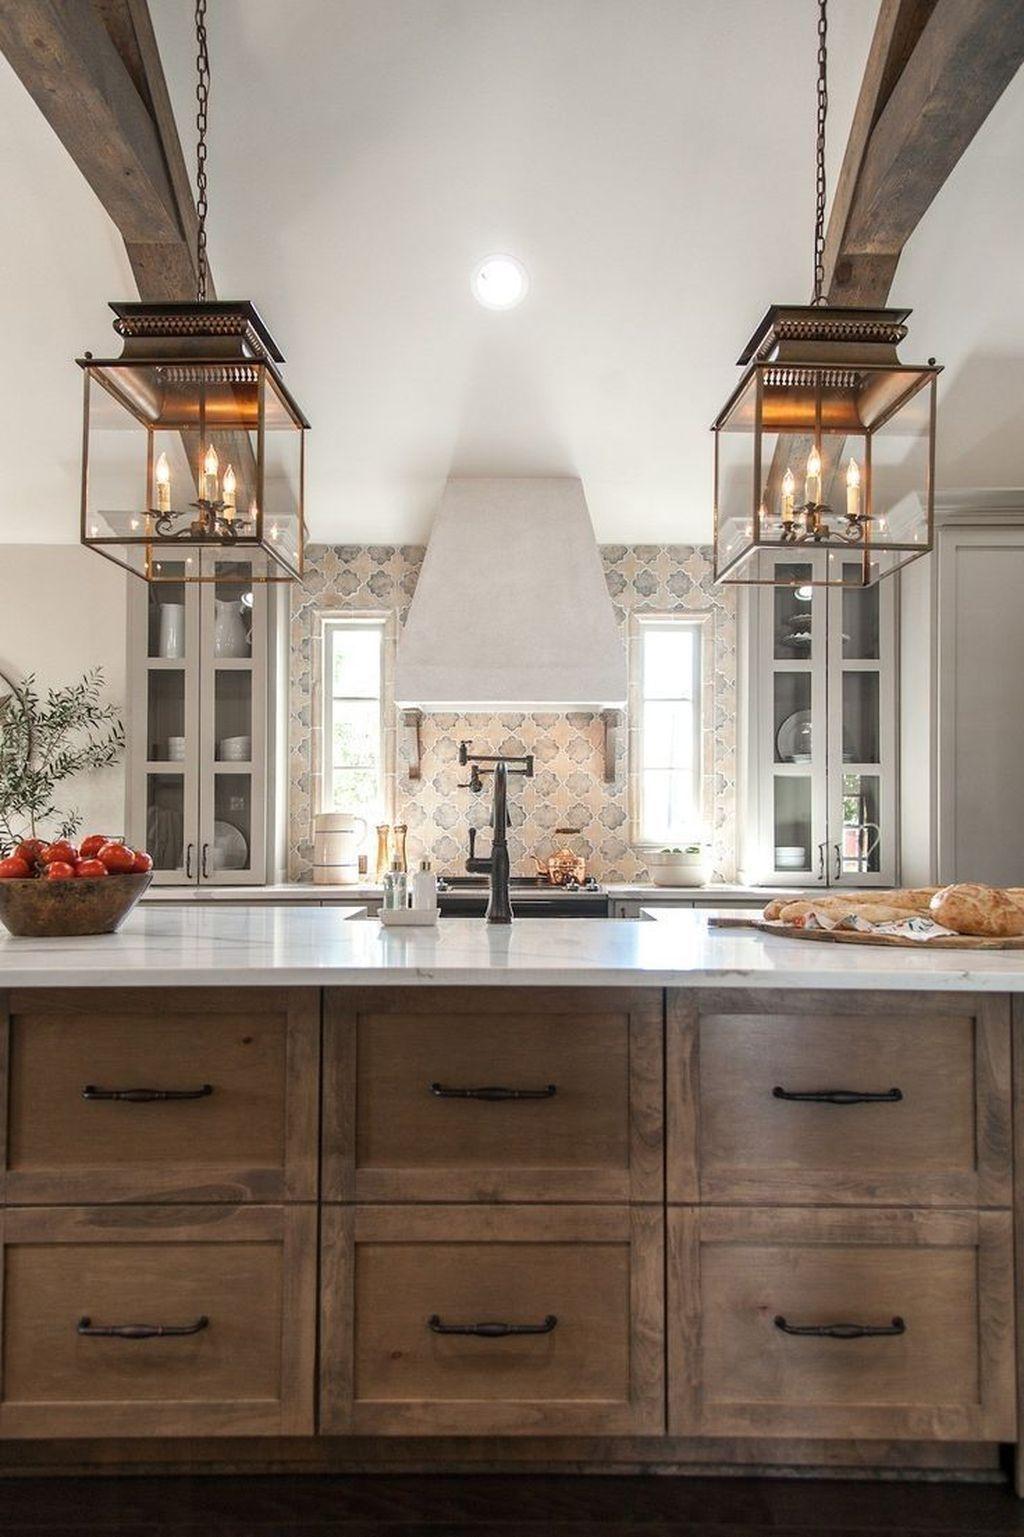 46 the best modern farmhouse kitchen design ideas to blend modern rh pinterest com